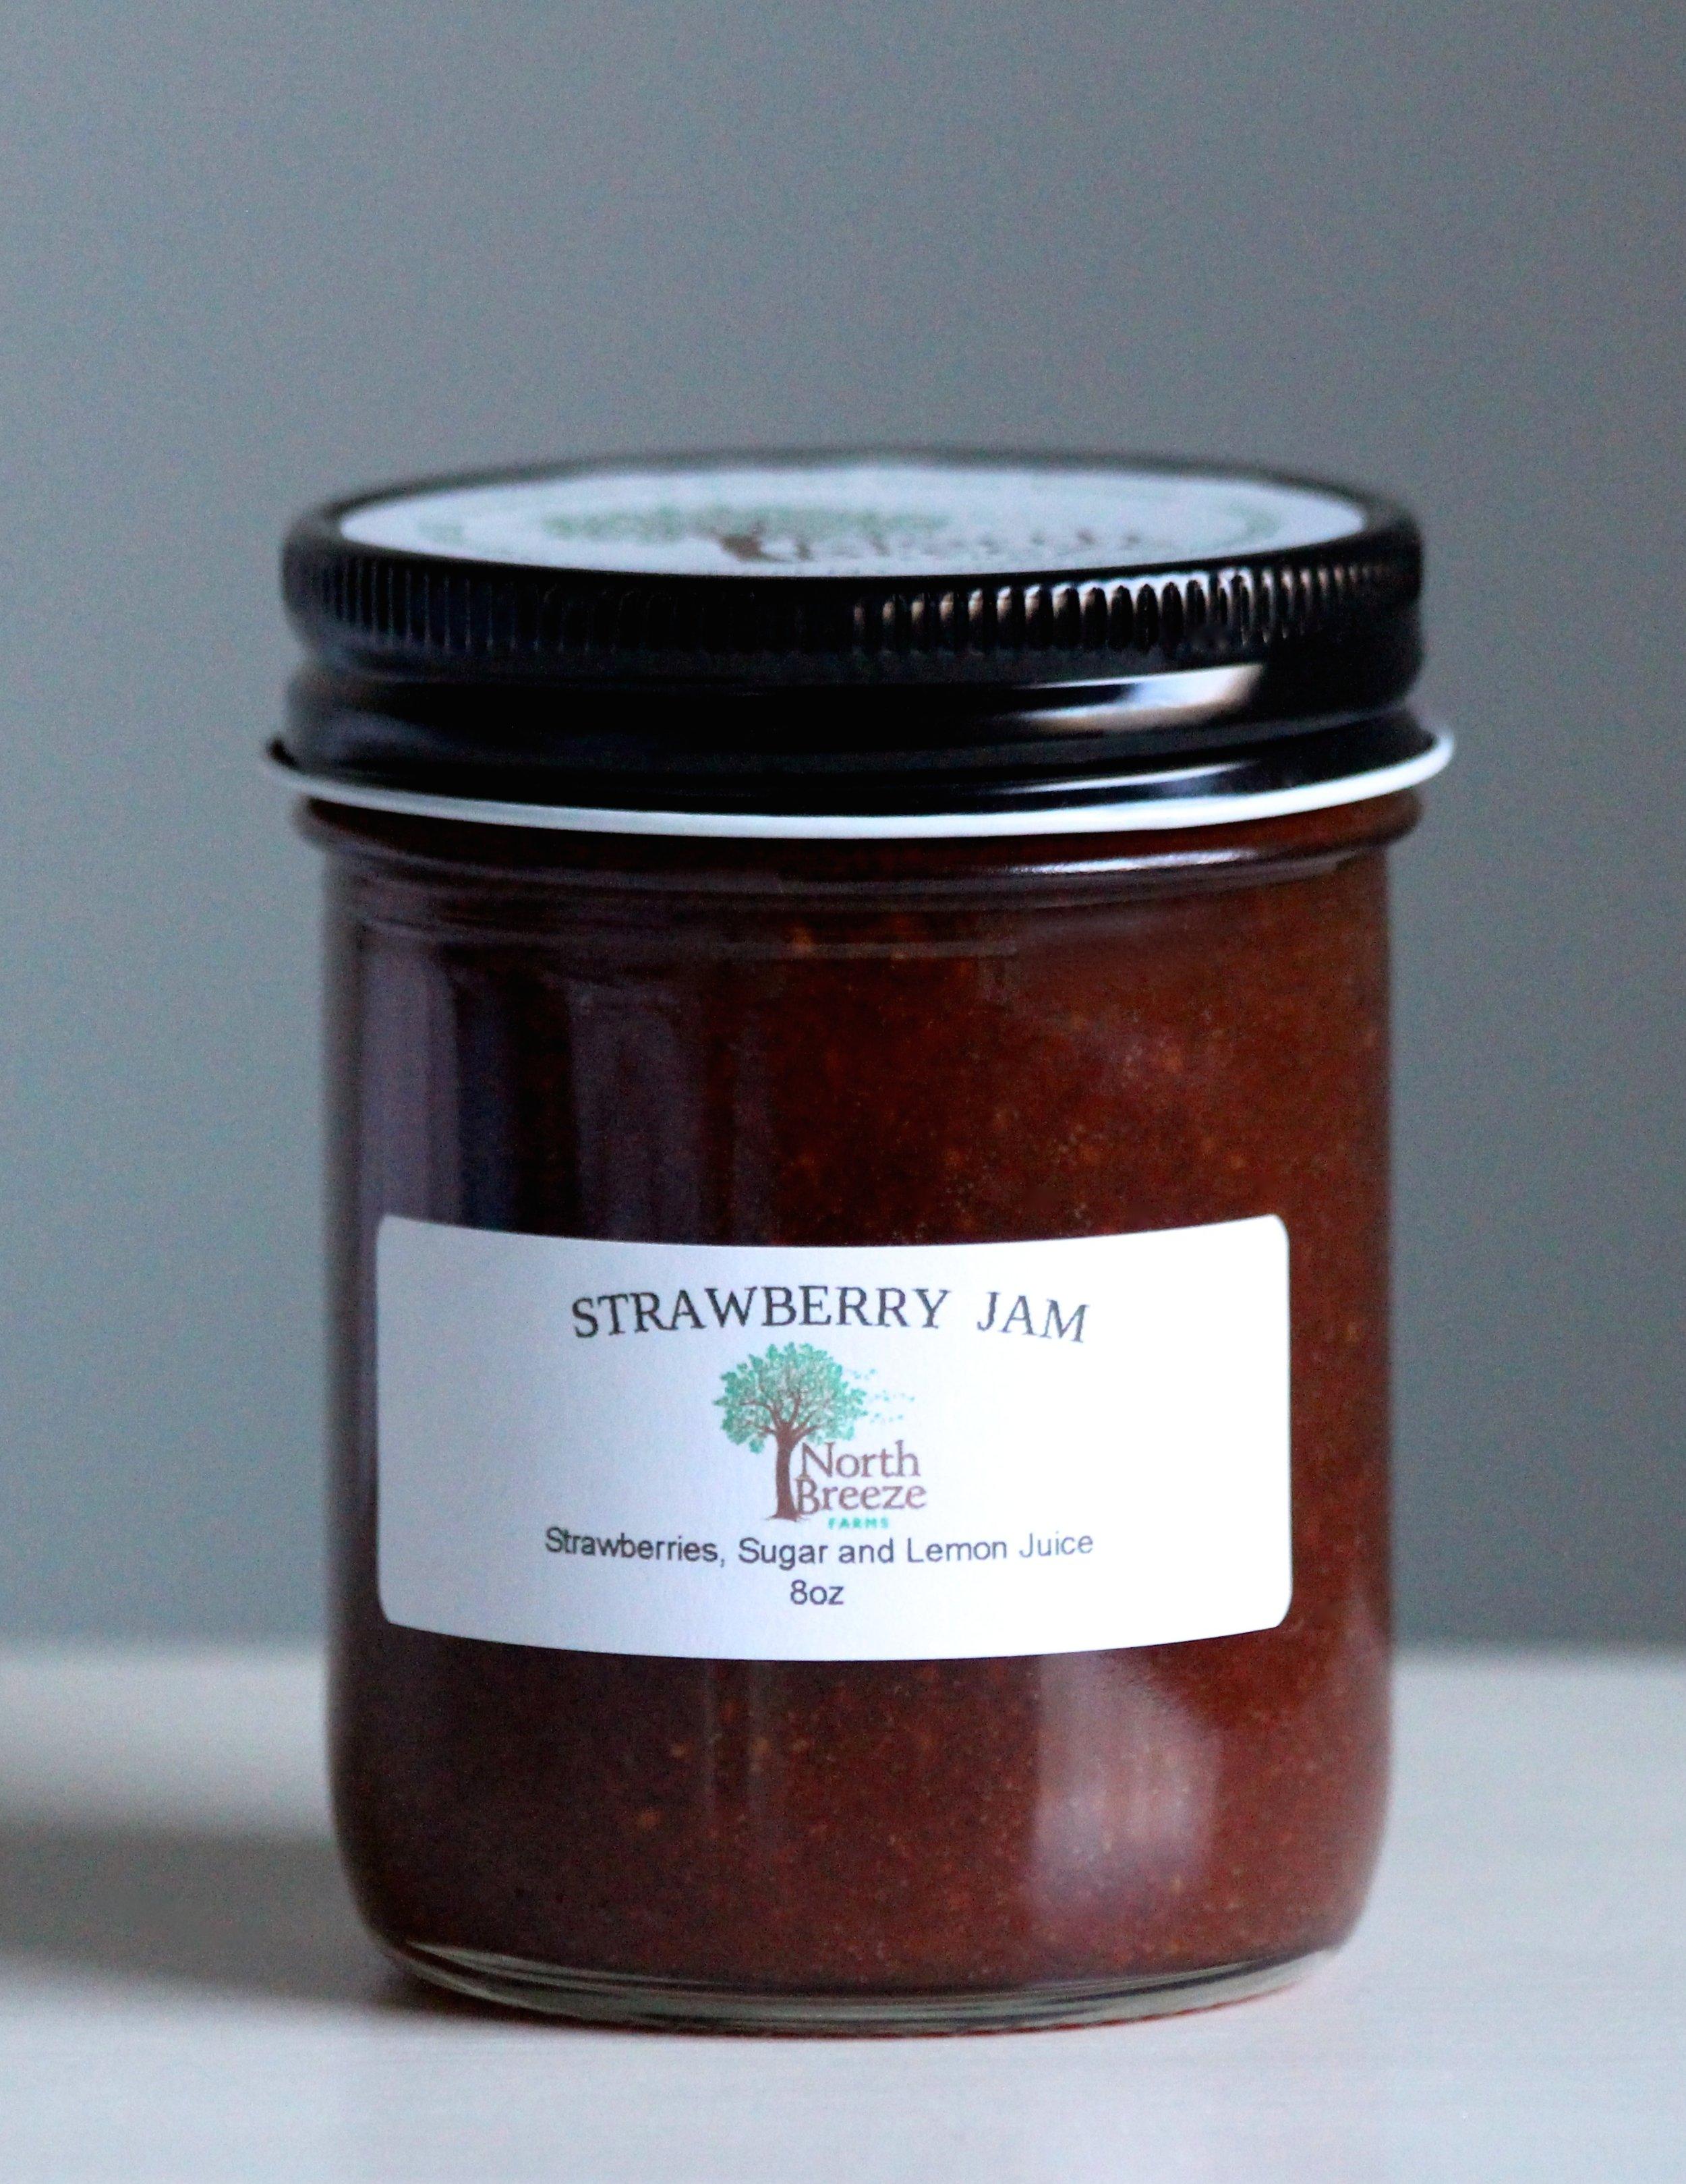 Strawberry Jam $12